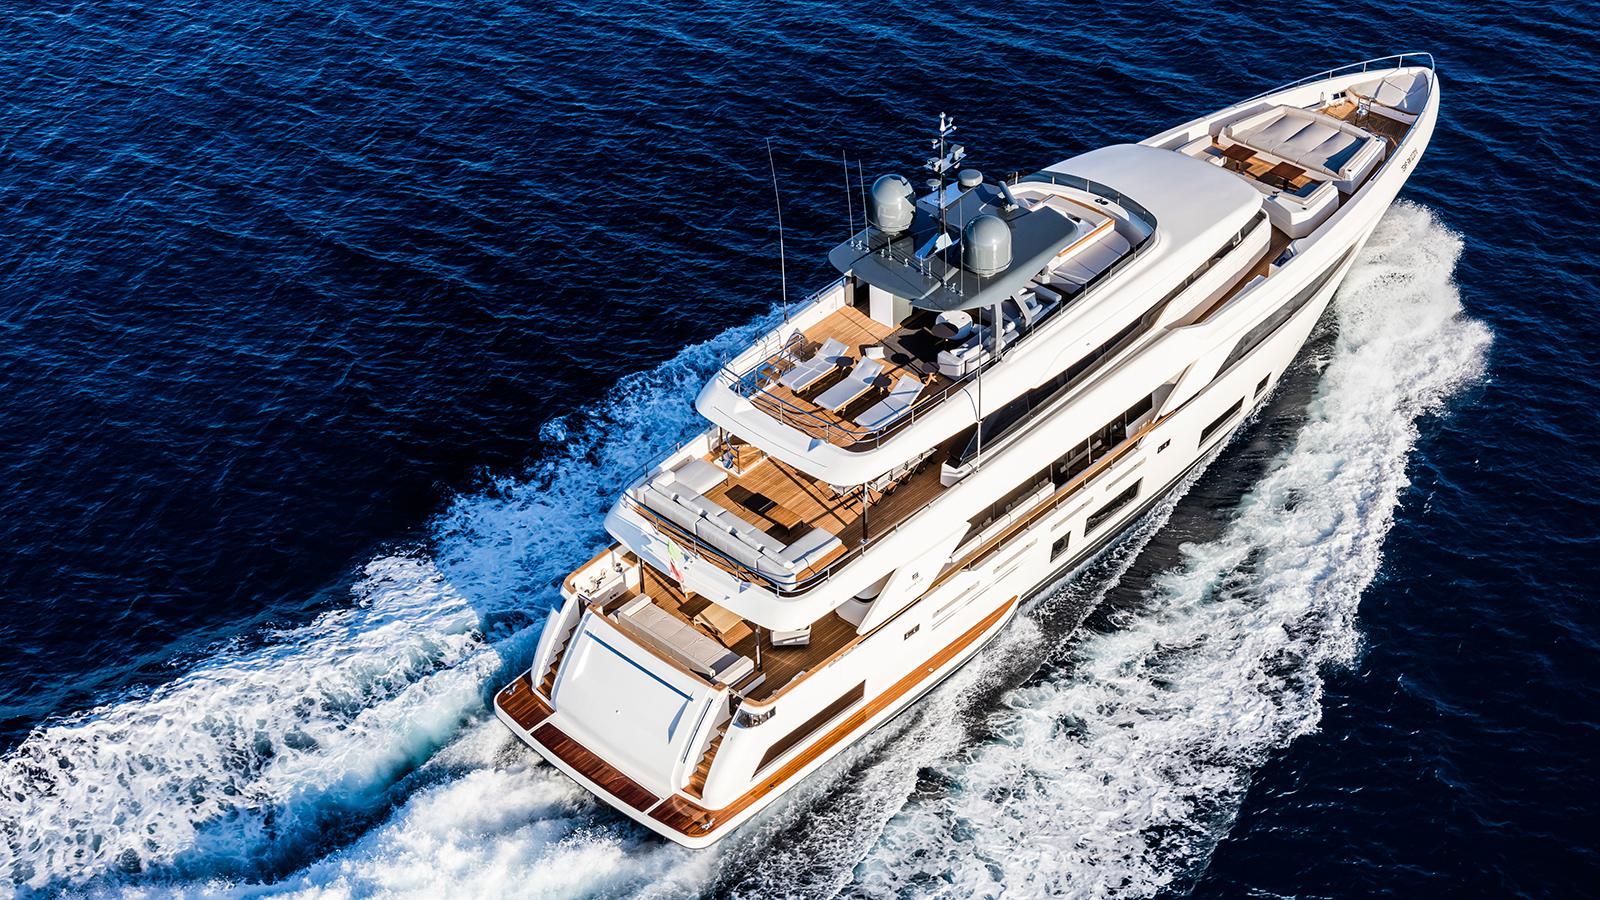 aerial-view-of-the-custom-line-navetta-37-superyacht